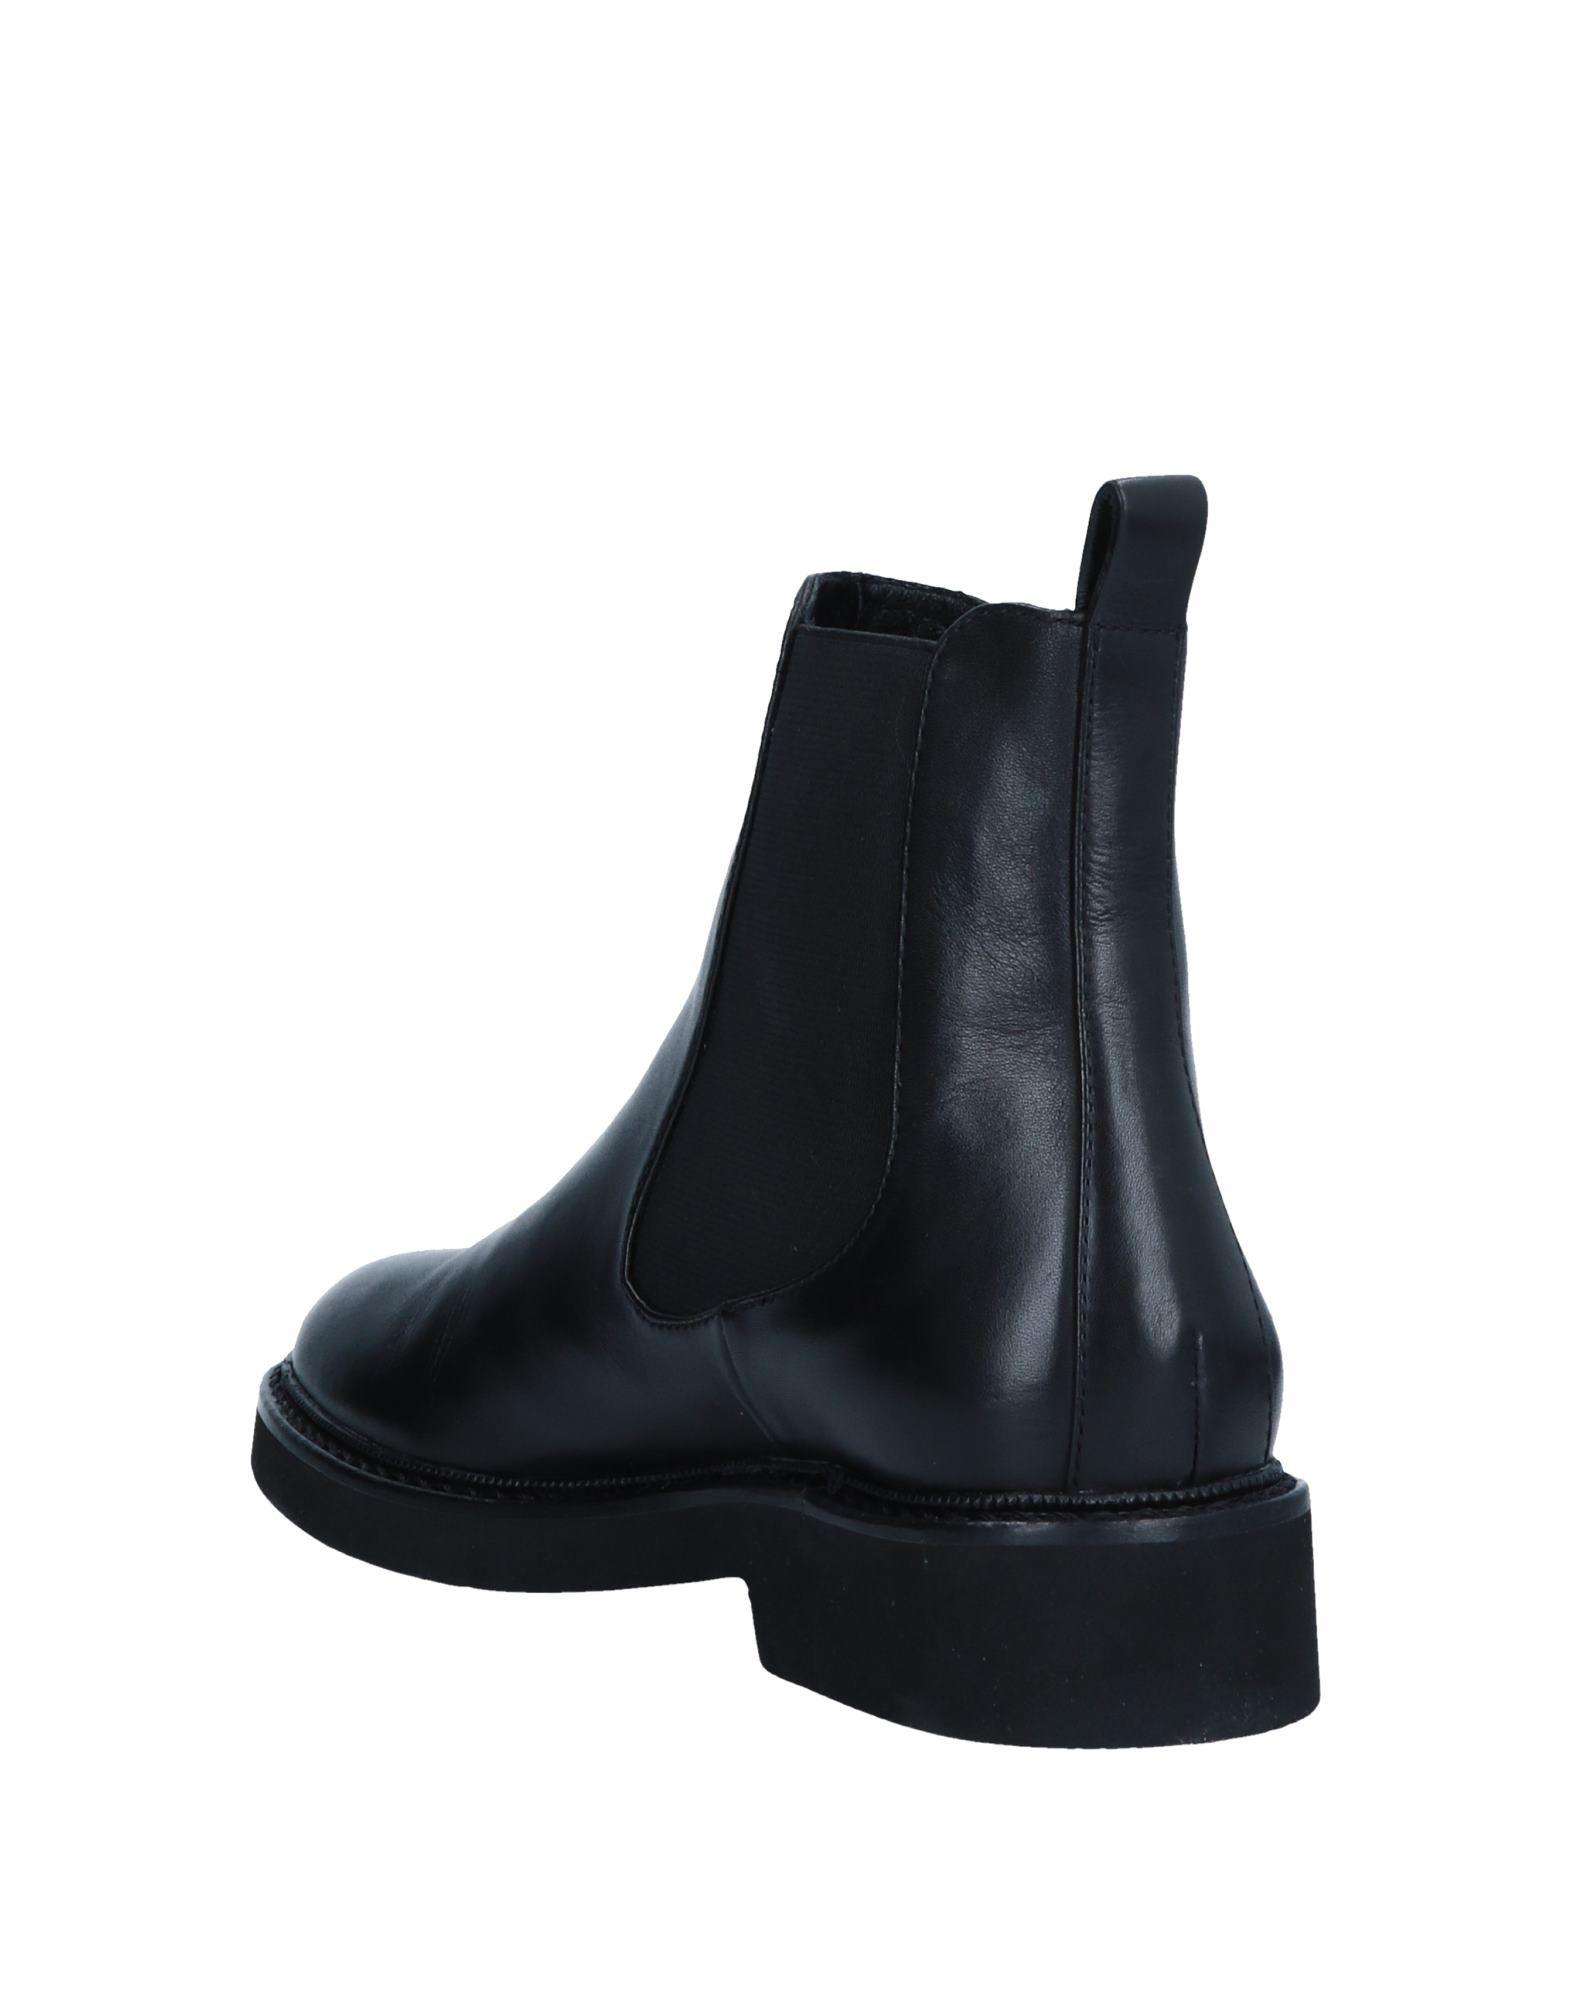 Gut um billige Schuhe zu tragenBruno  Premi Chelsea Boots Damen  tragenBruno 11552385ND 084b8e